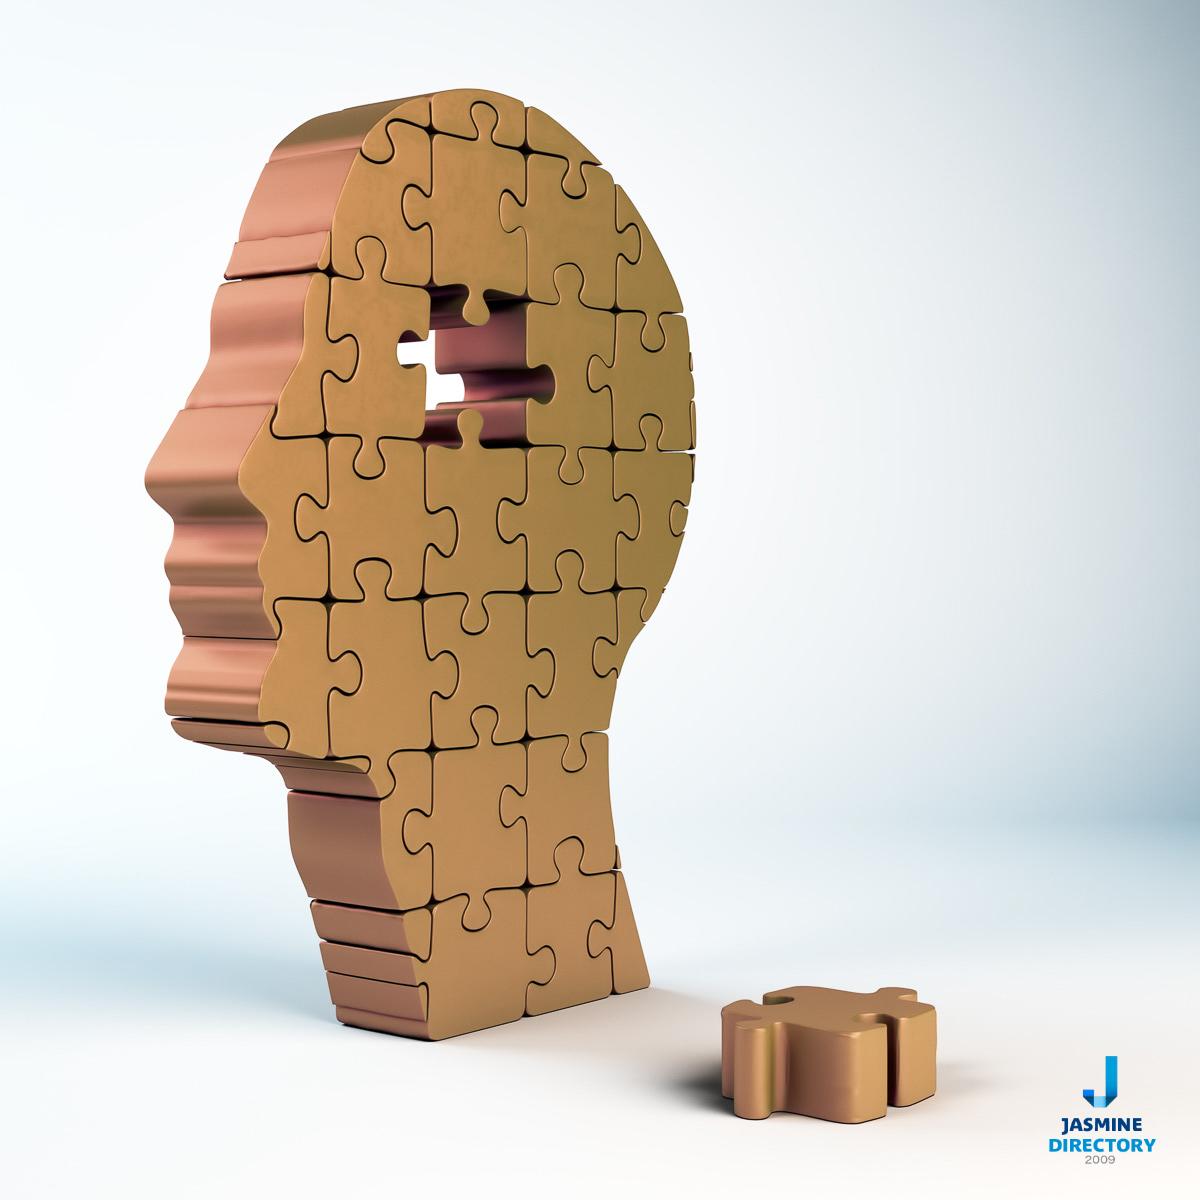 Asperger syndrome - Image